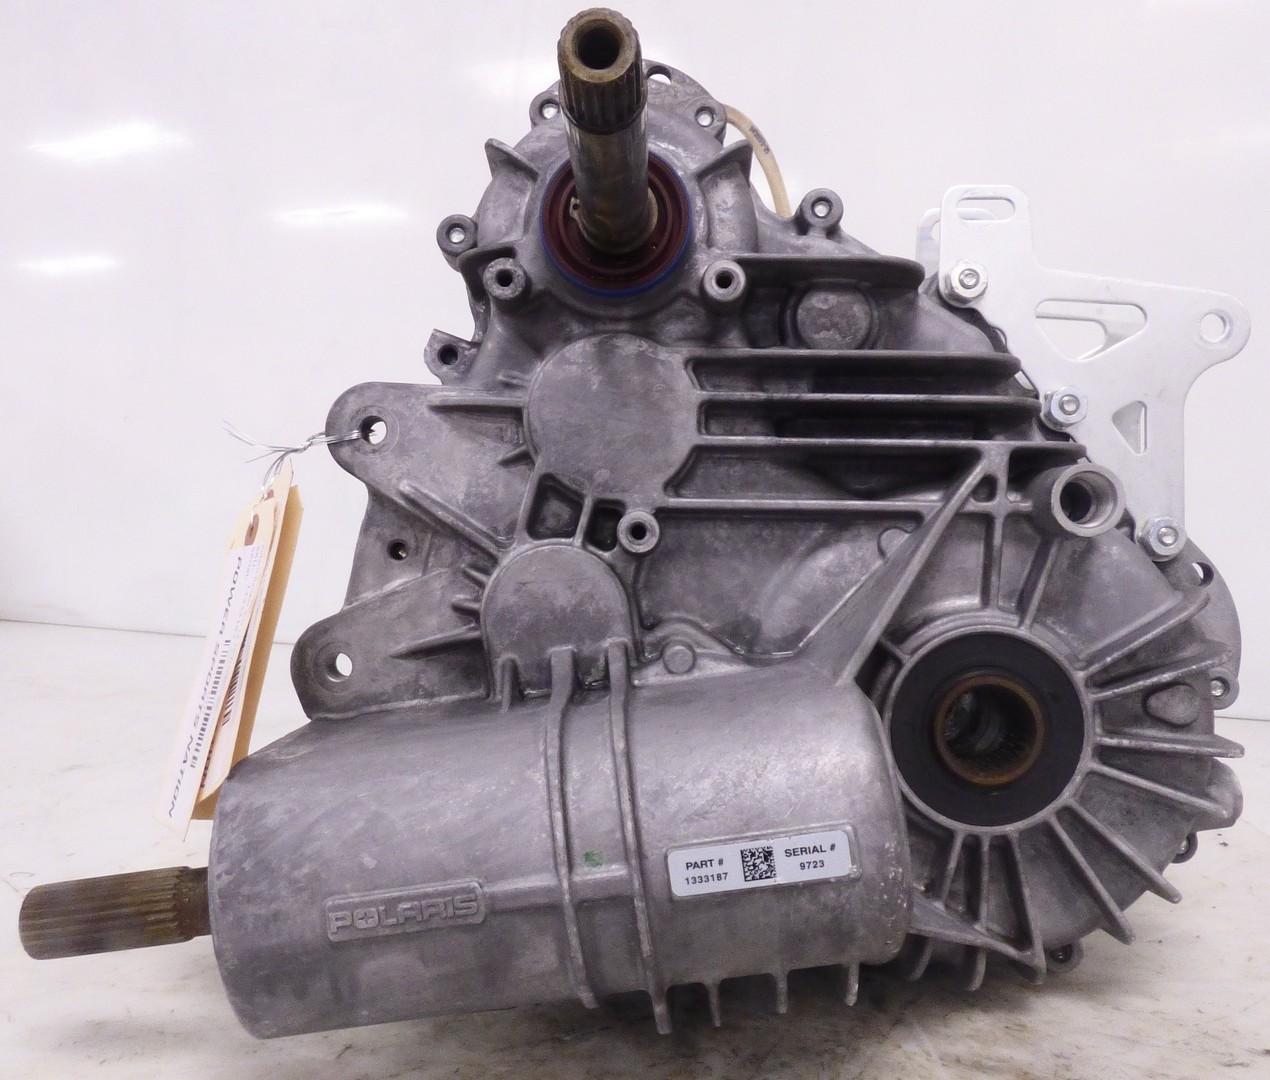 Details about Polaris Ranger 900 14-15 Rebuilt Transmission